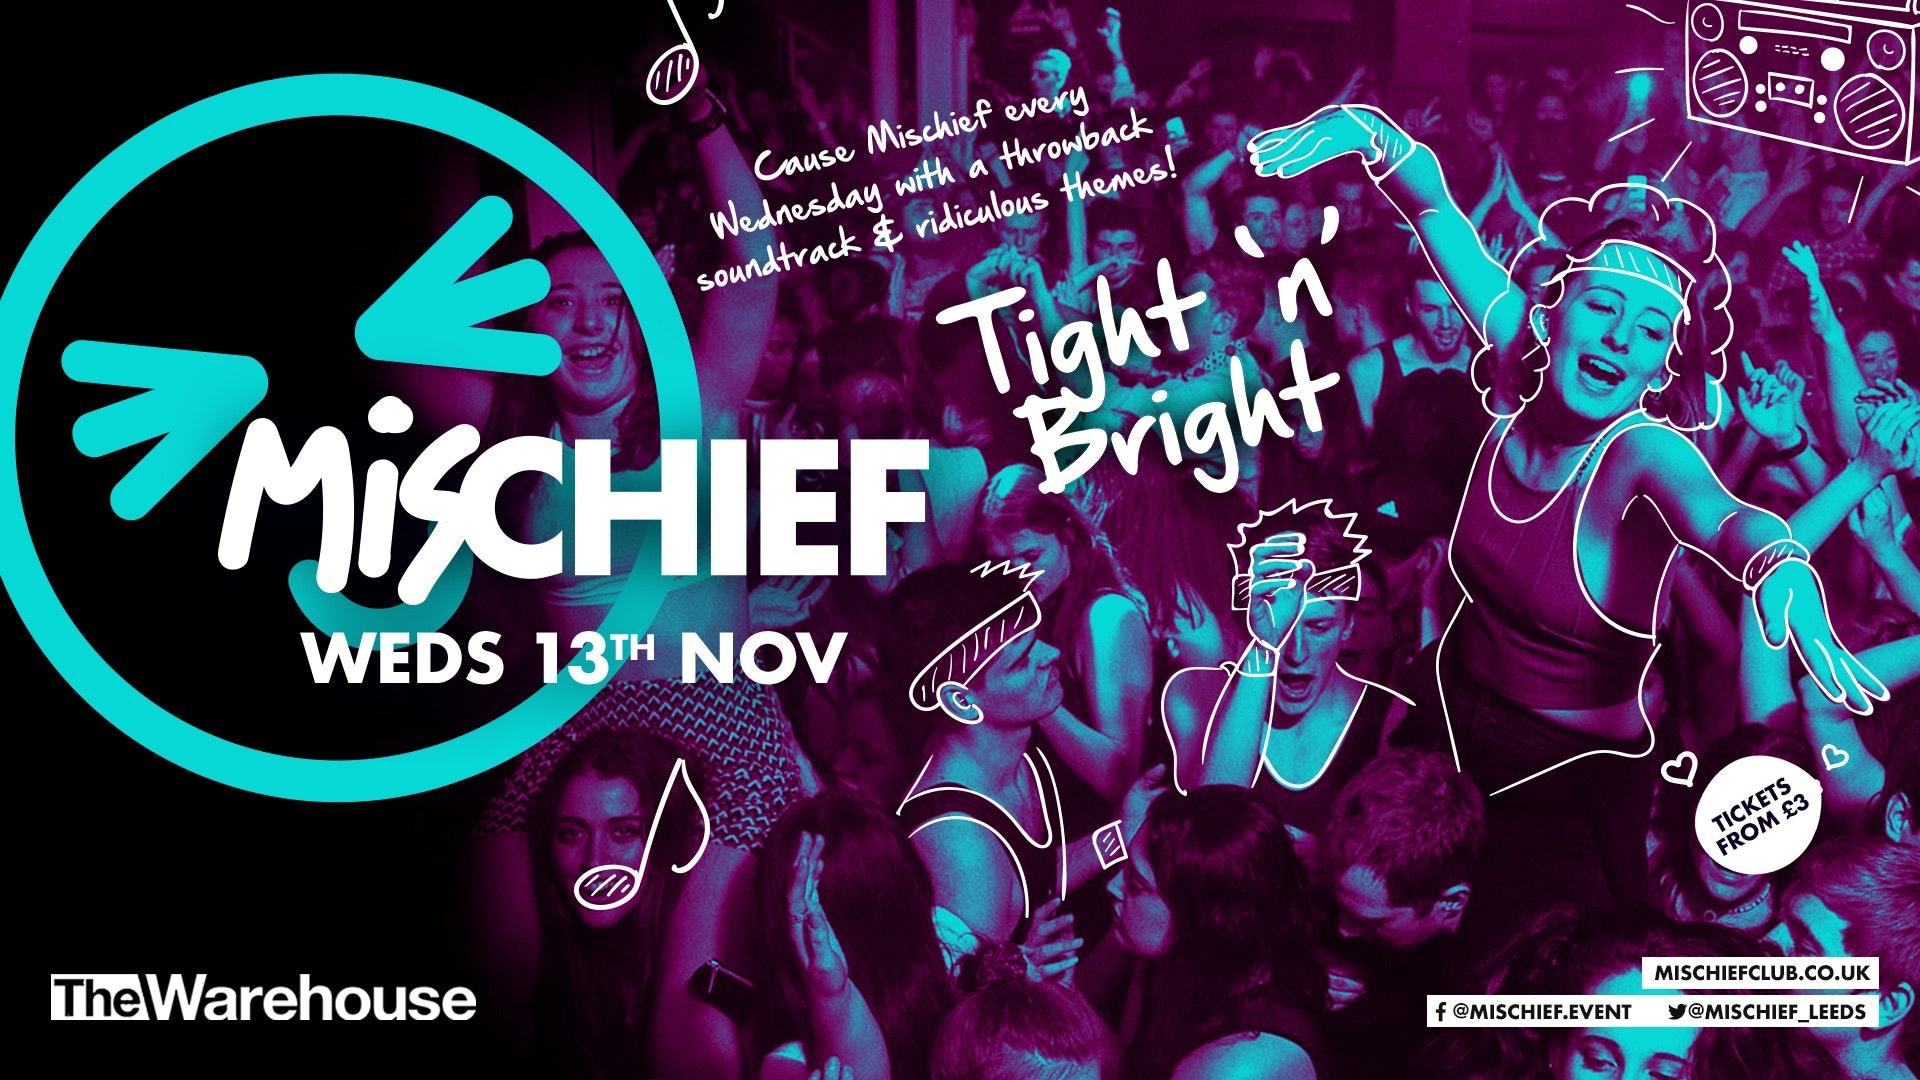 Mischief | Tight & Bright